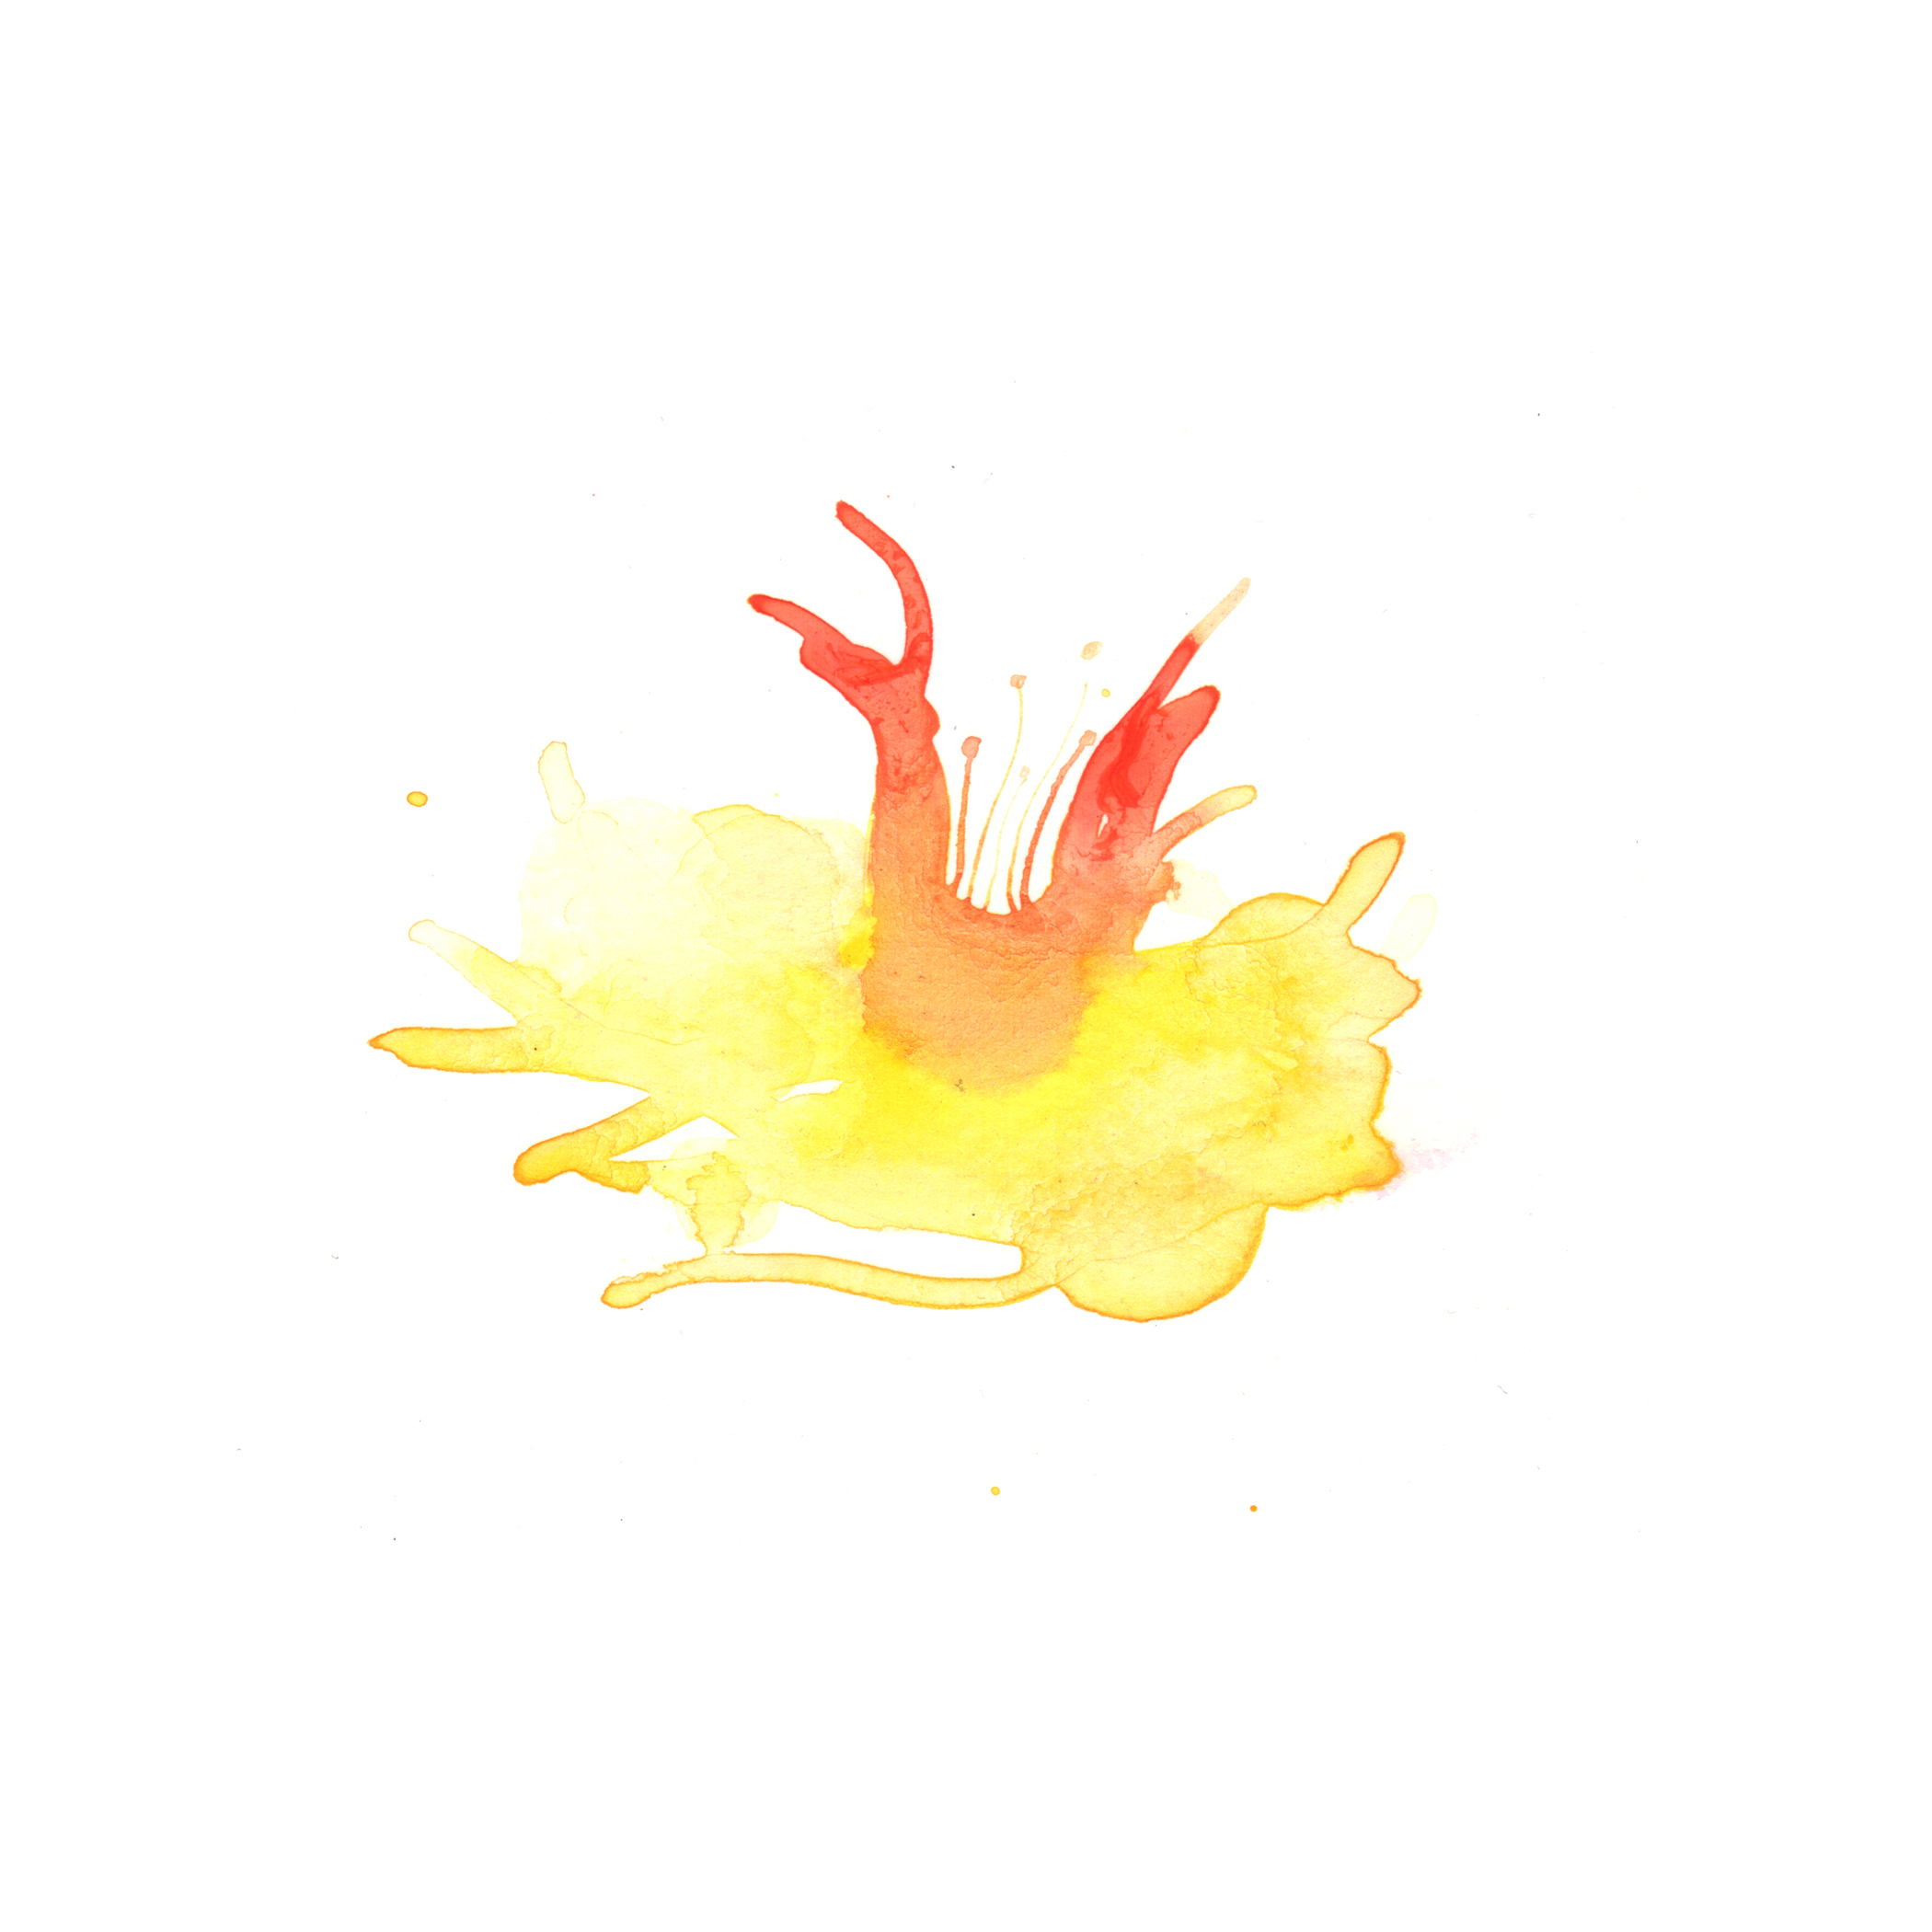 88.Daffodil.5.7.14.jpg